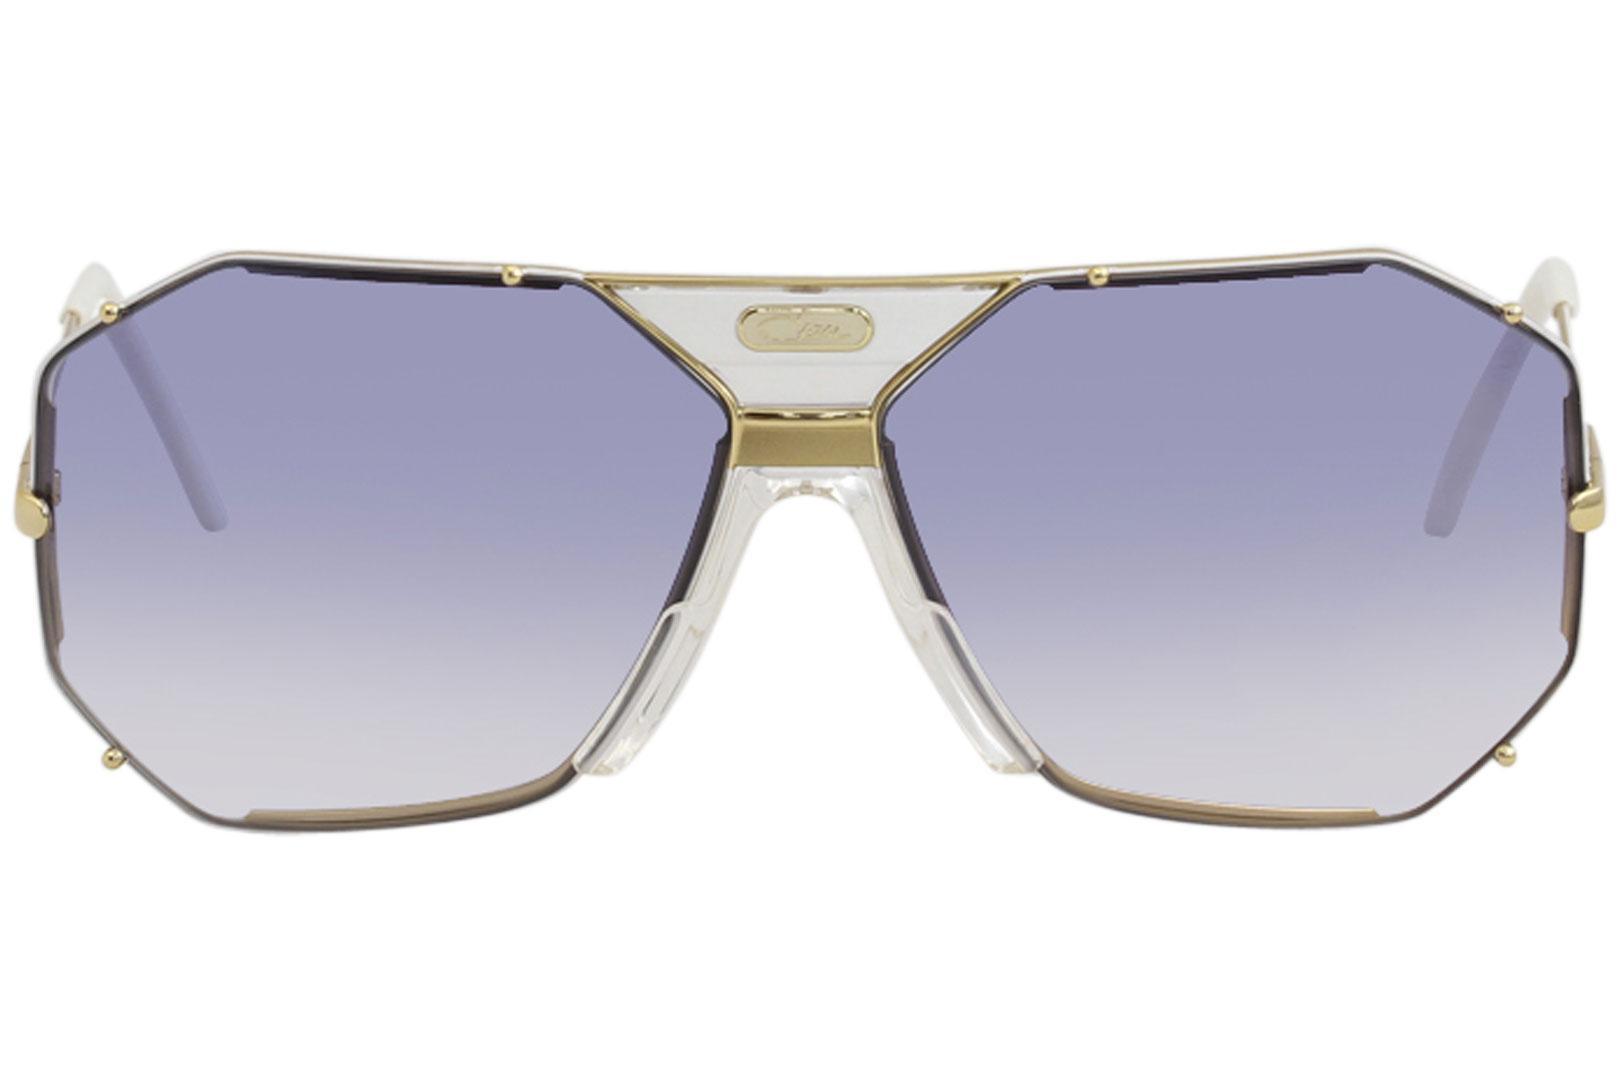 3fccf869d288 Cazal Legends 905 Retro Fashion Pilot Sunglasses